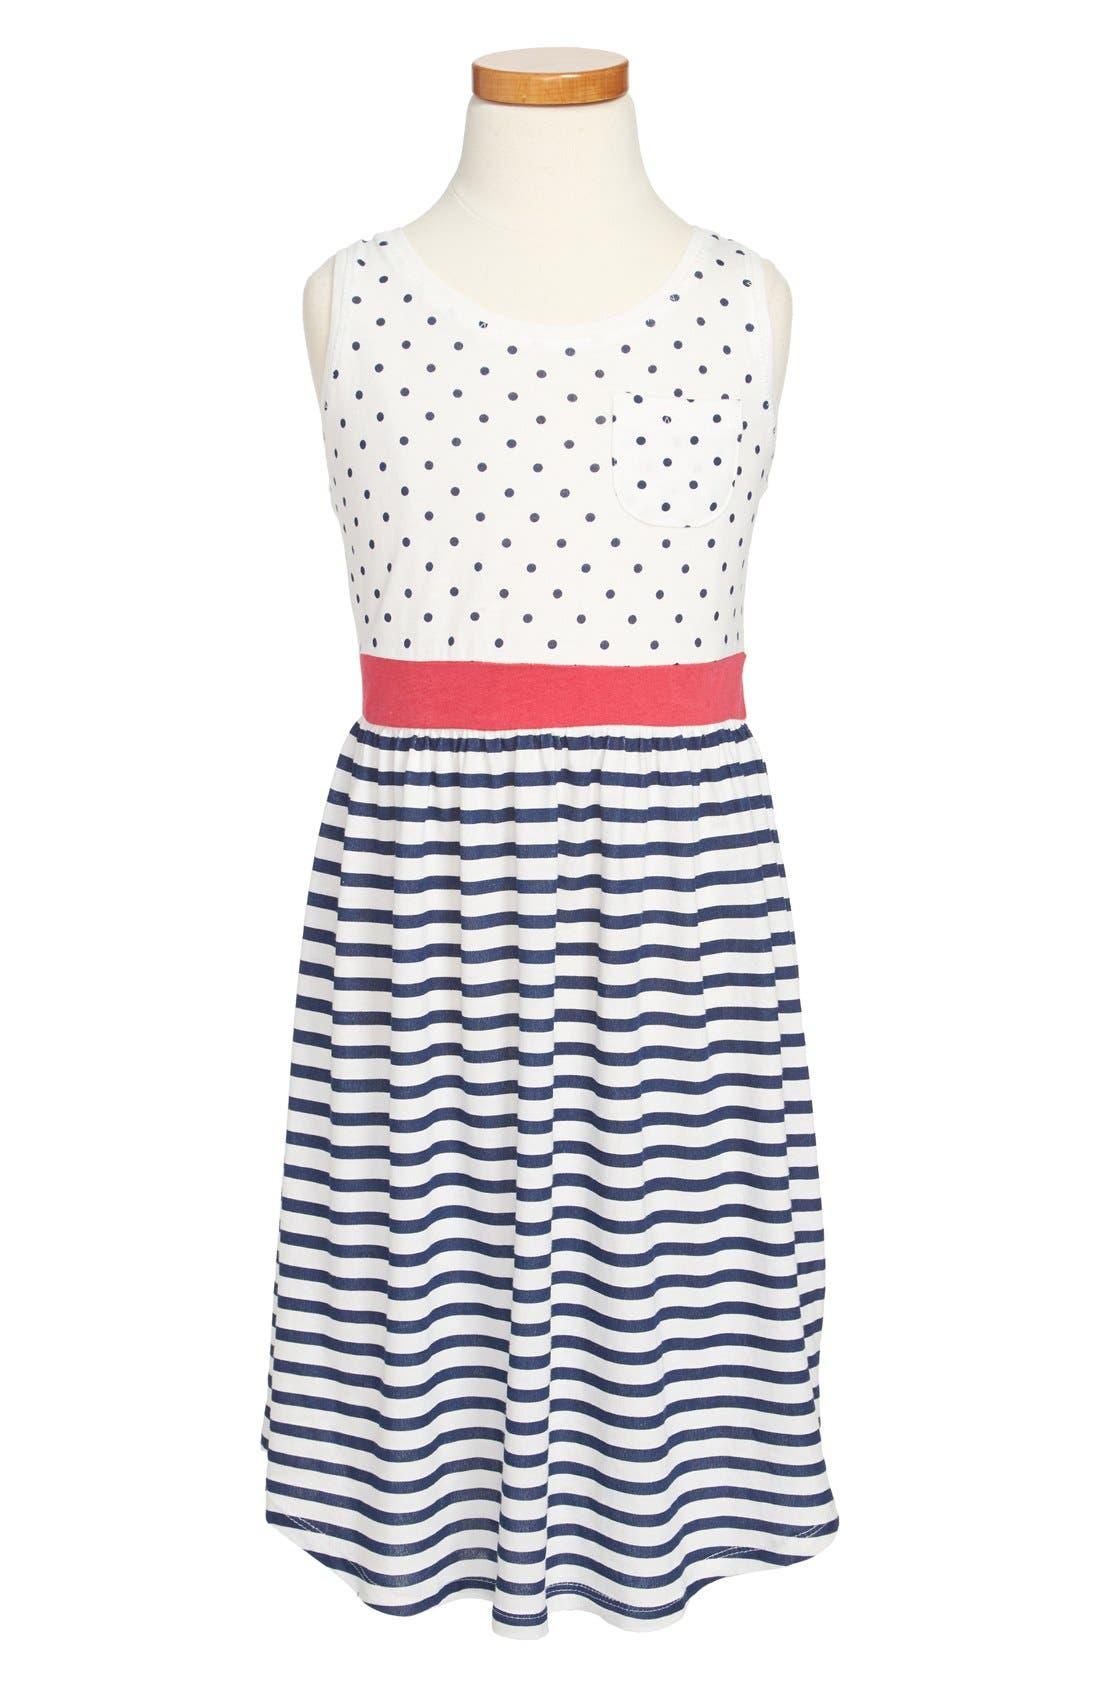 Main Image - Roxy 'Have Fun' Tank Dress (Big Girls)